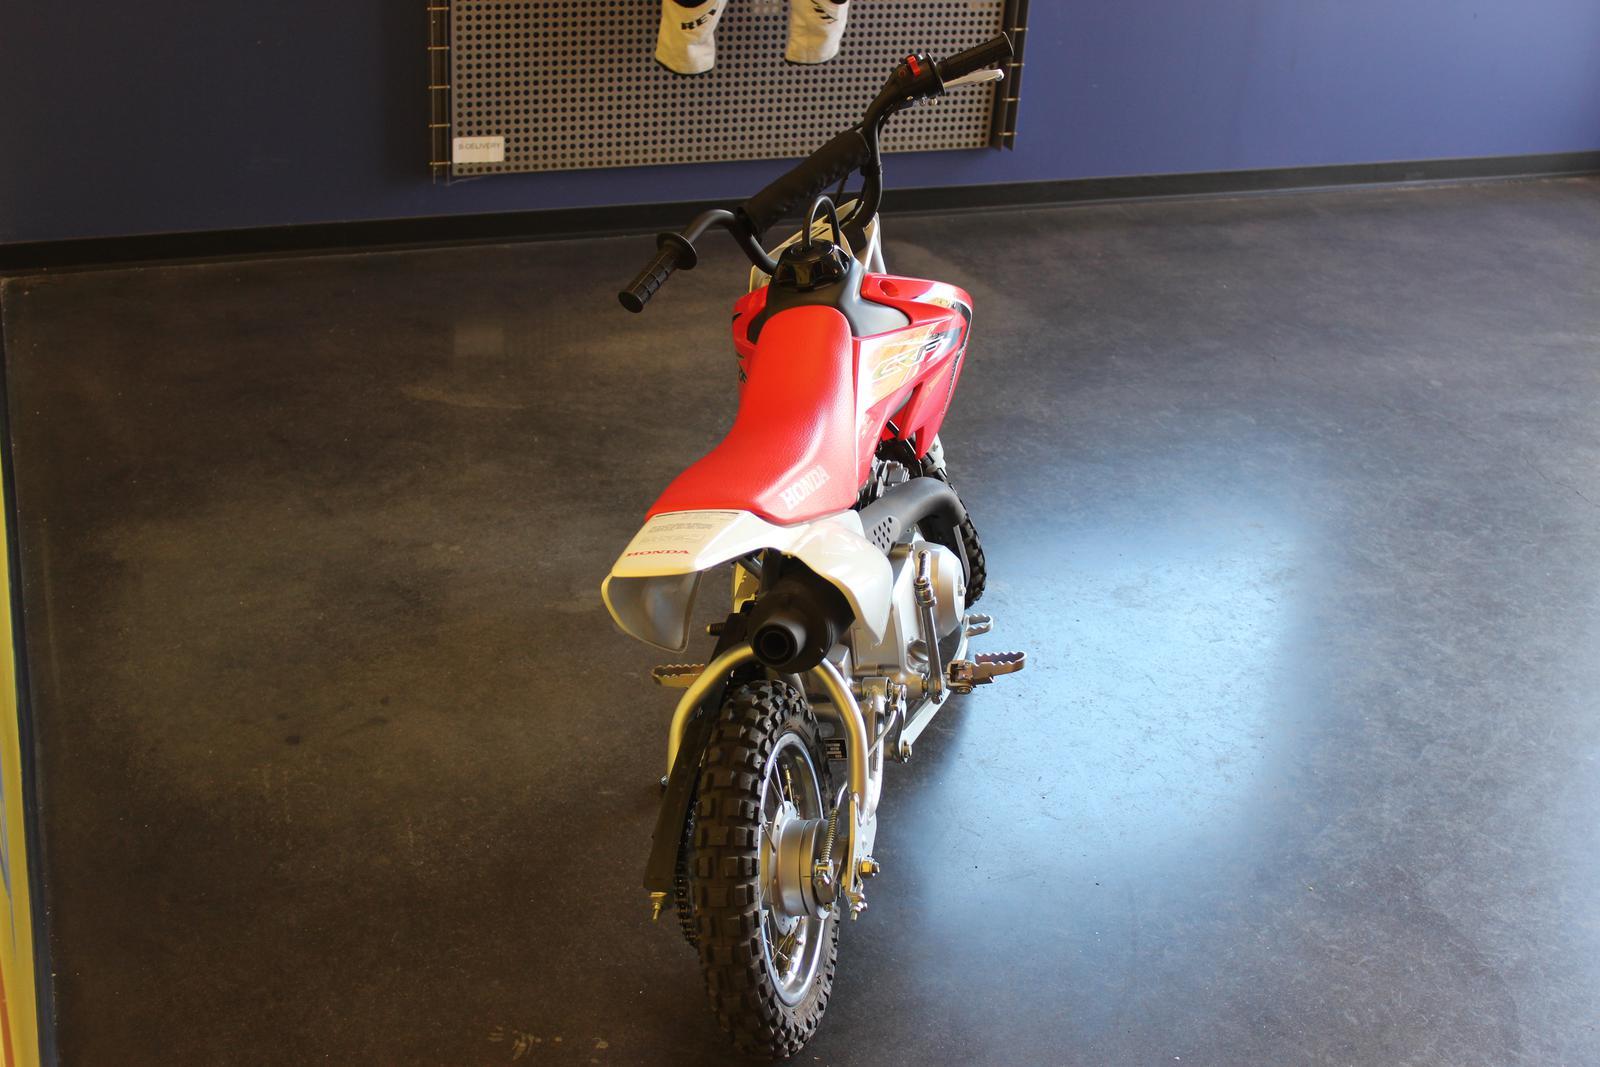 2018 honda crf50f for sale in scottsdale, az | go az motorcycles